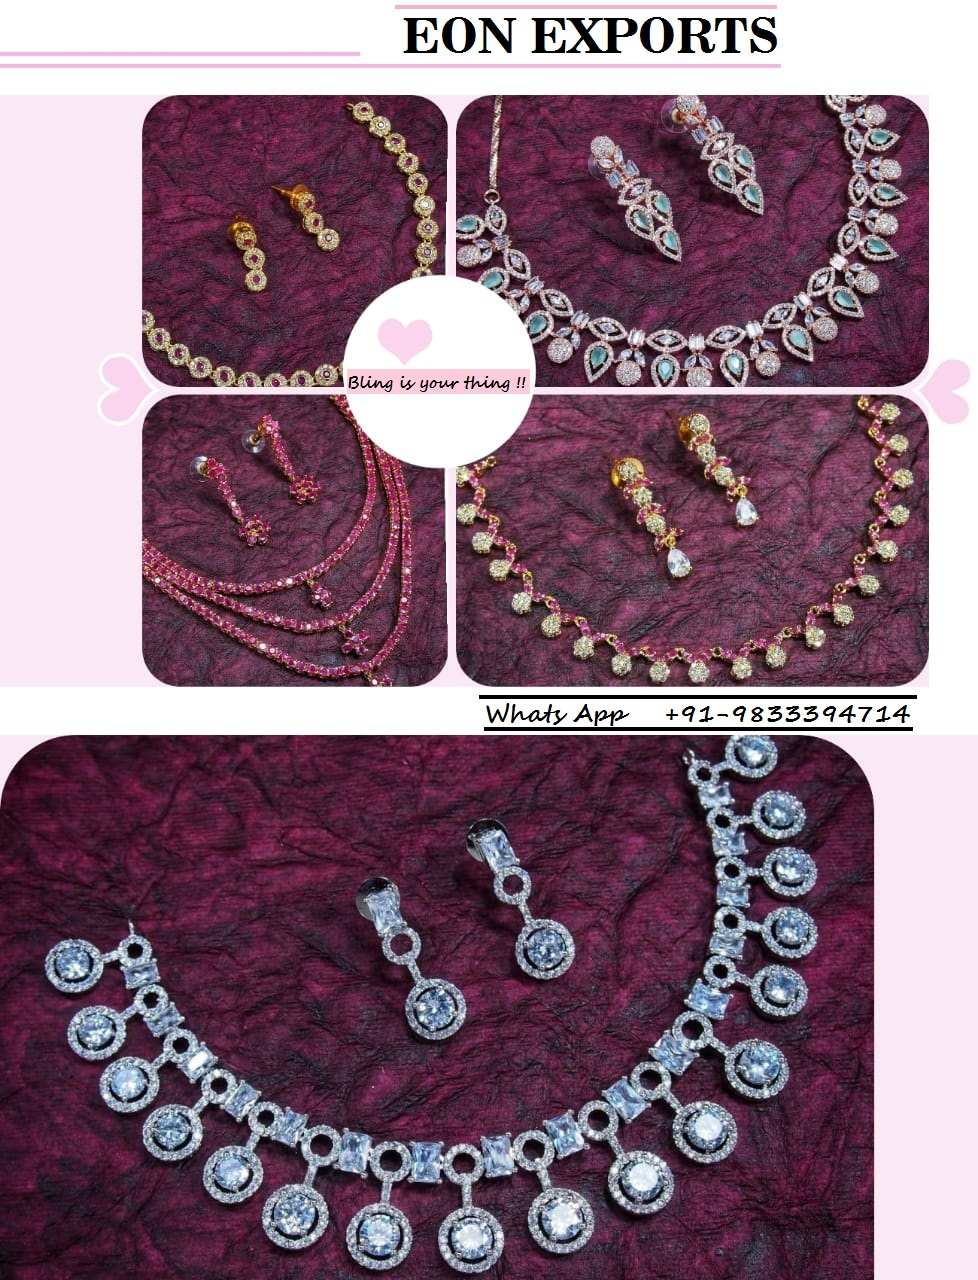 Indian jewelry beautiful bridal party bollywood necklace set Mala set high quality statement American Diamonds Cubic zirconia set